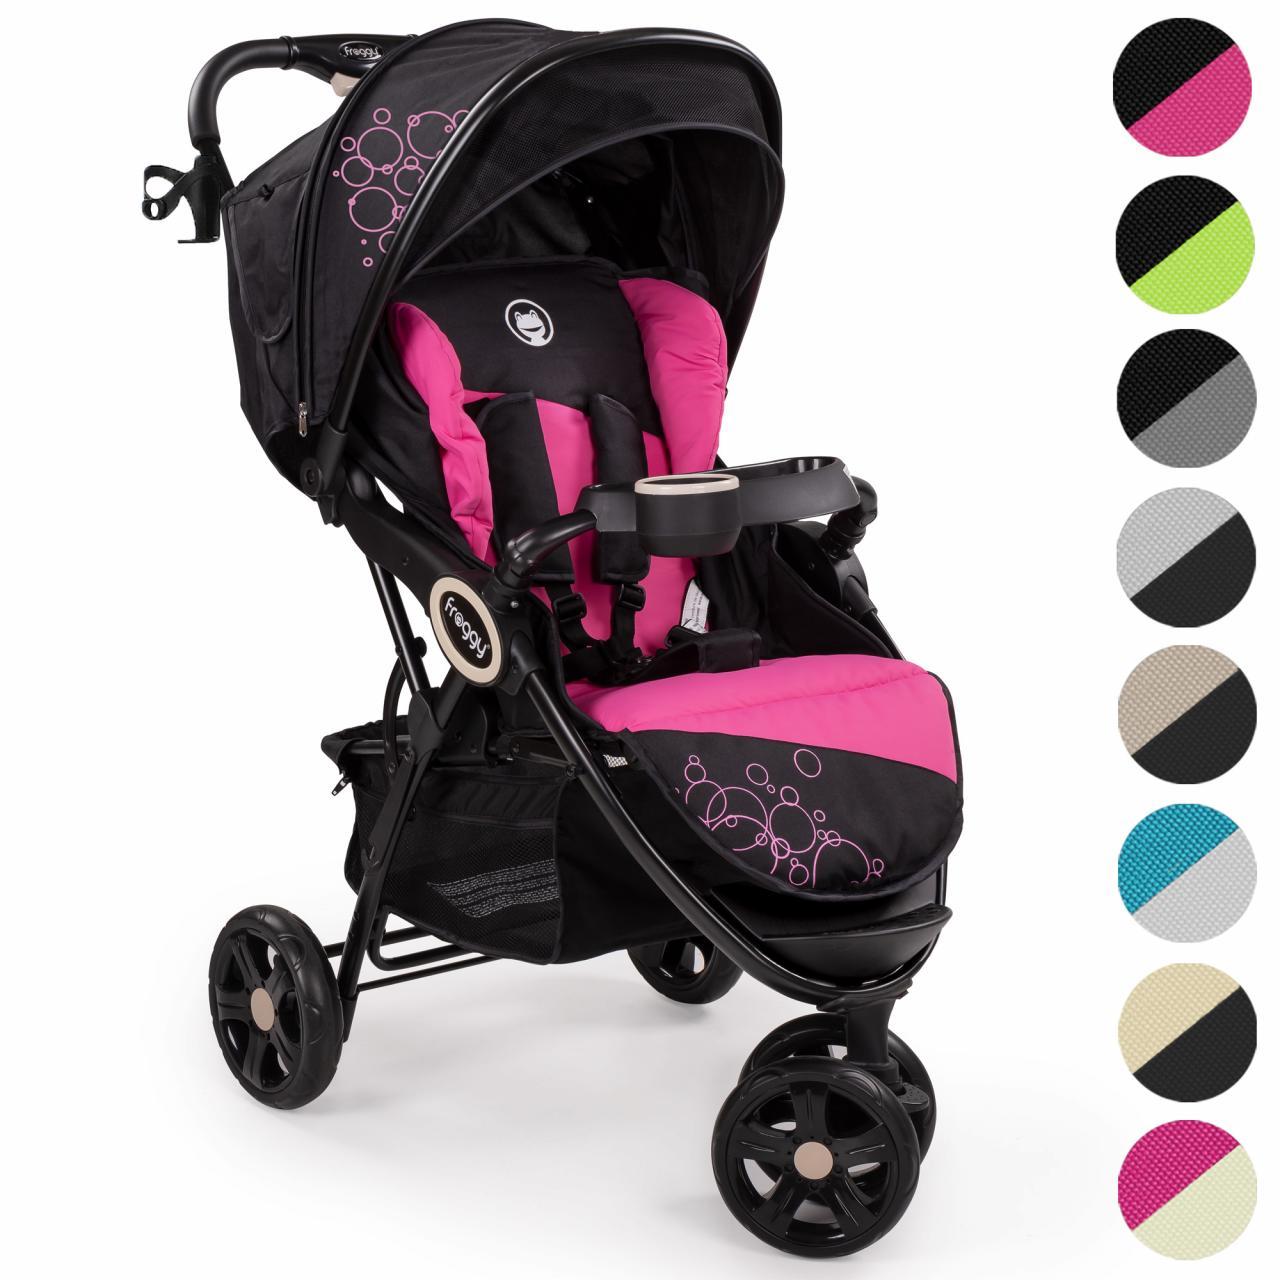 froggy kinderwagen dingo buggy sportwagen kinder babywagen 3 rad farbauswahl ebay. Black Bedroom Furniture Sets. Home Design Ideas